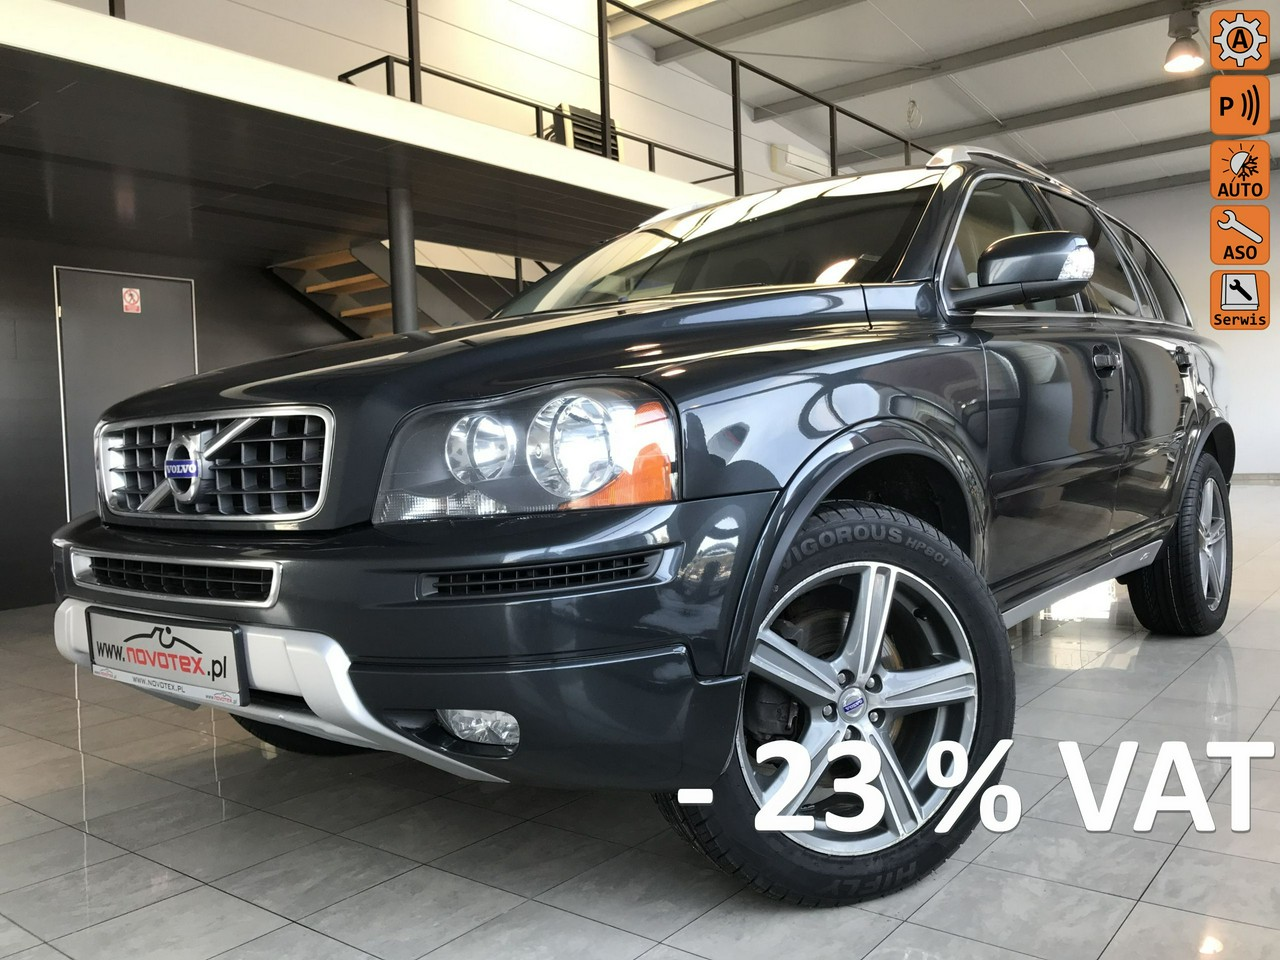 Volvo XC 90 D4*Momentum*mod 2014*automat*7-os*200KM*ALU19*serwis ASO*gwarancja VIP